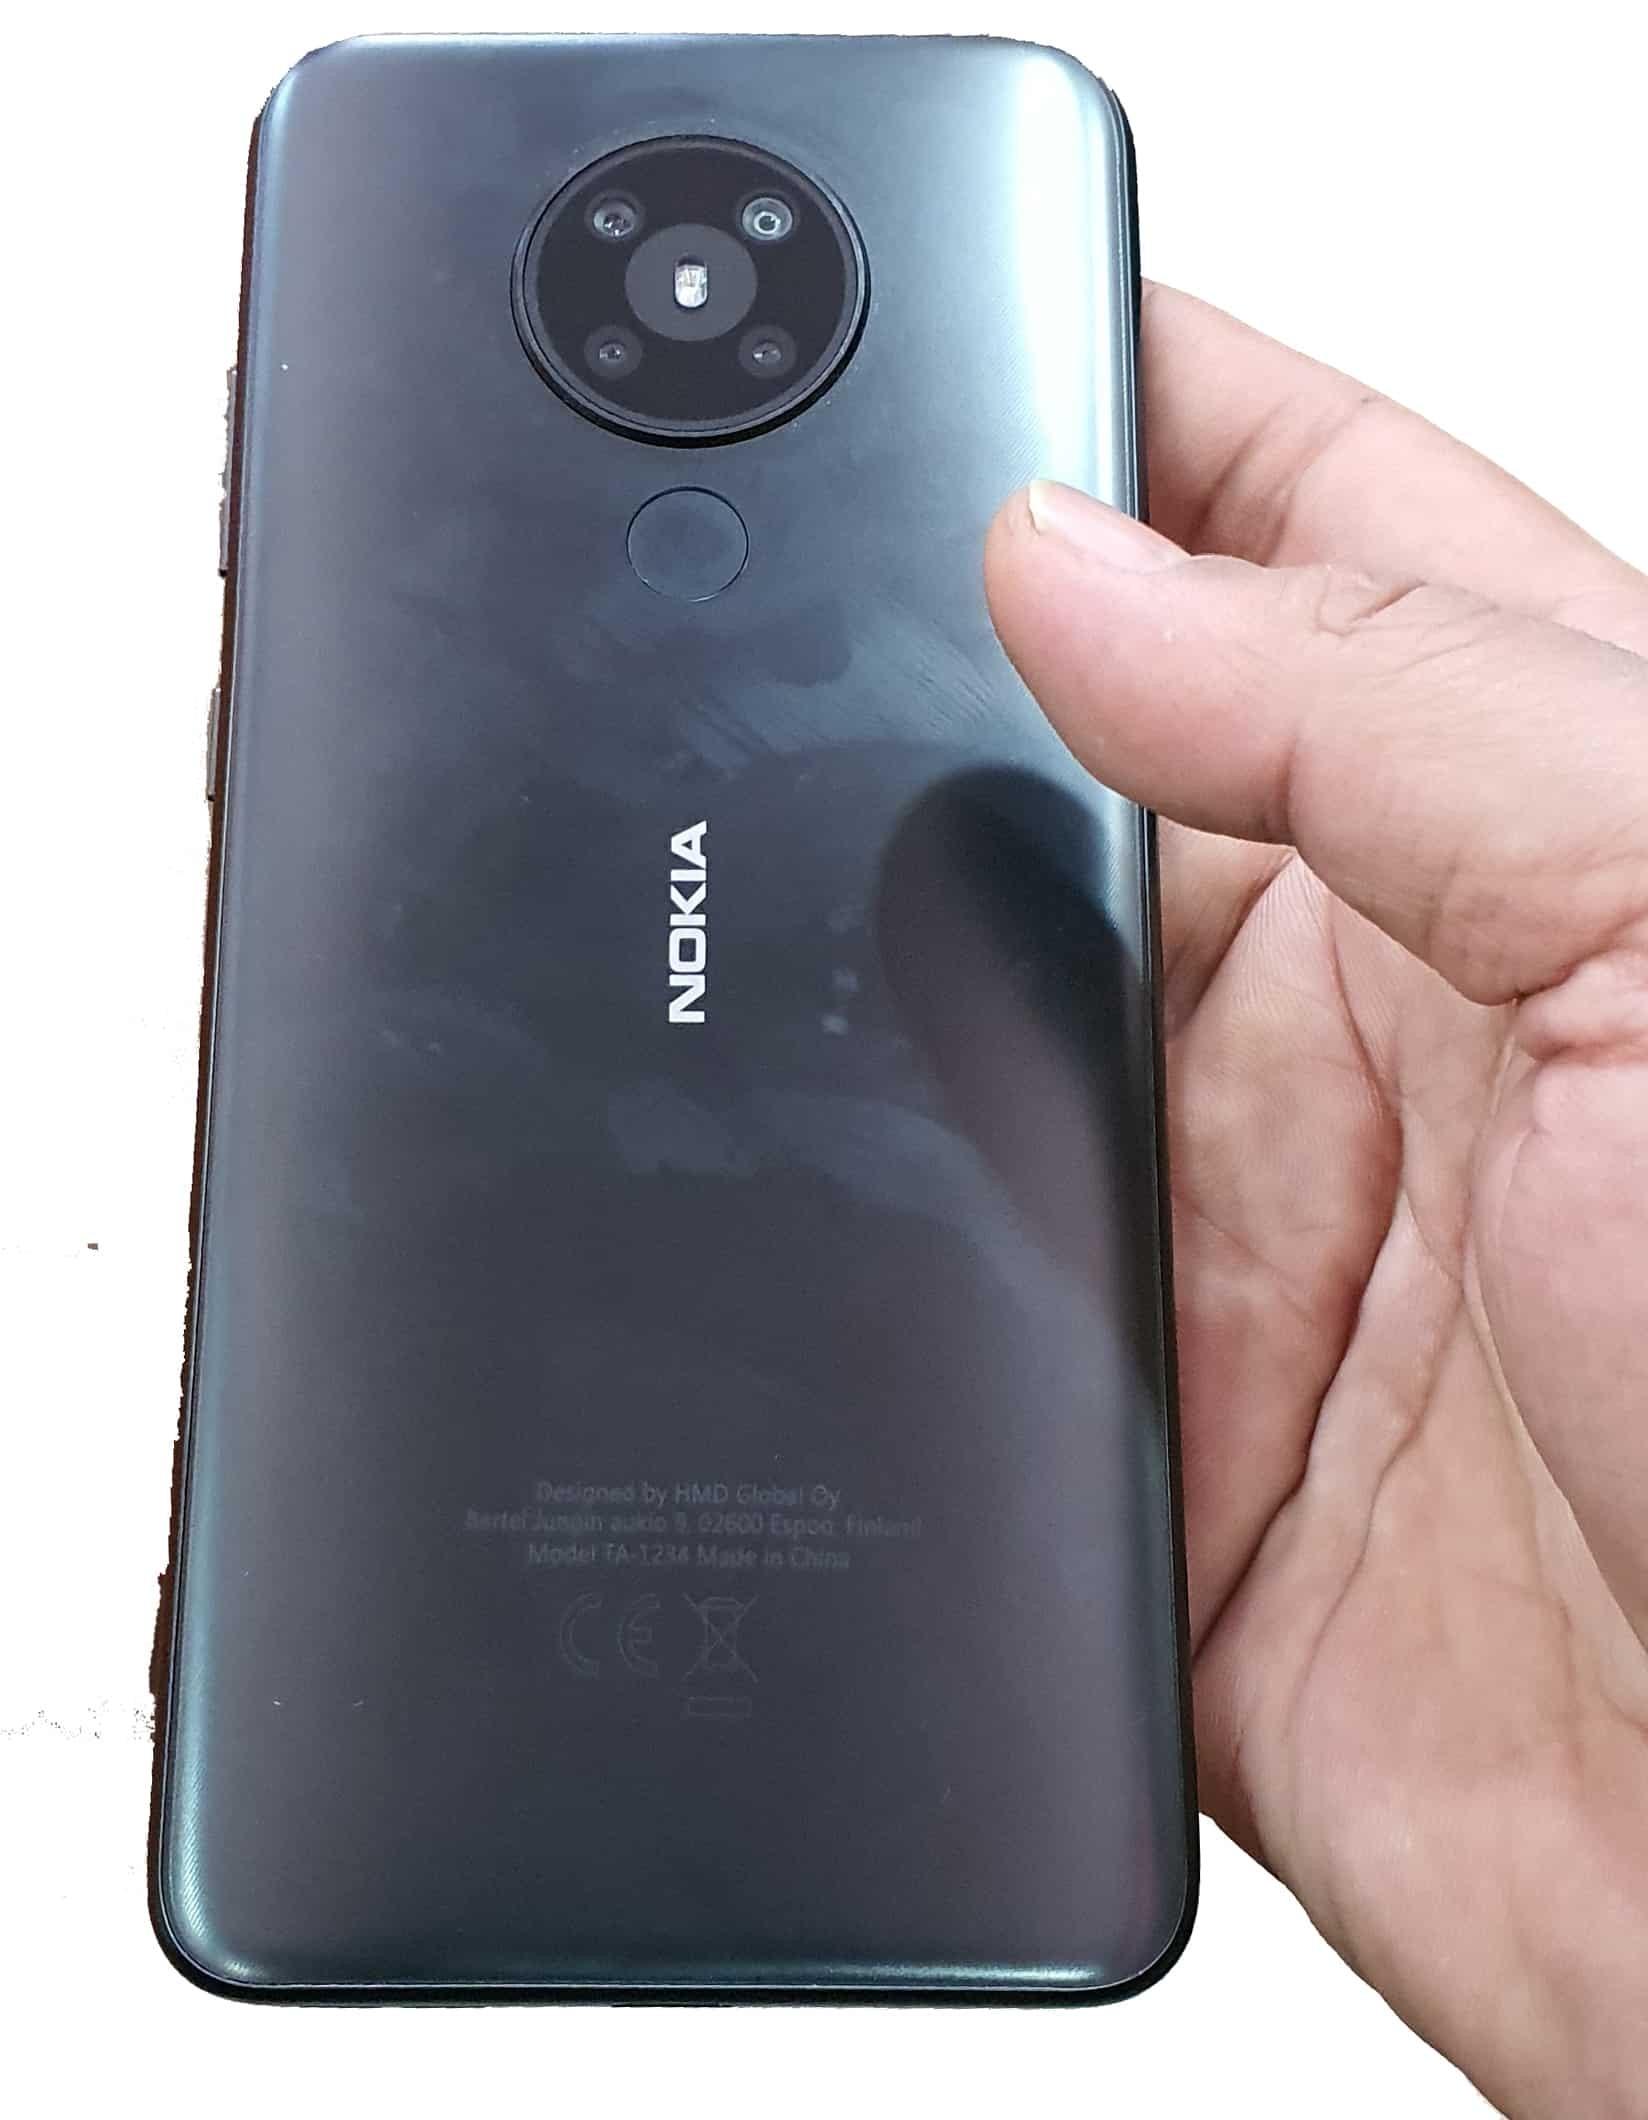 Nokia 5.2 Live Photos, nokia 5.2 release date